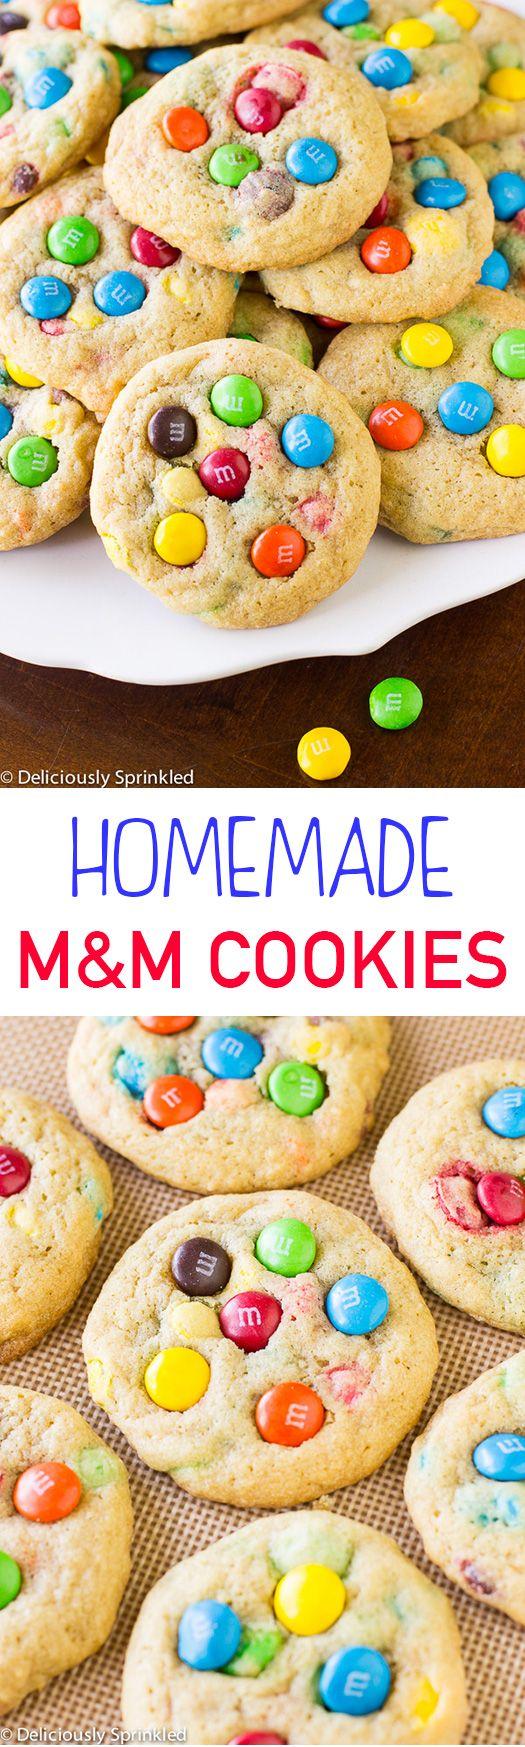 Homemade M&M Cookies